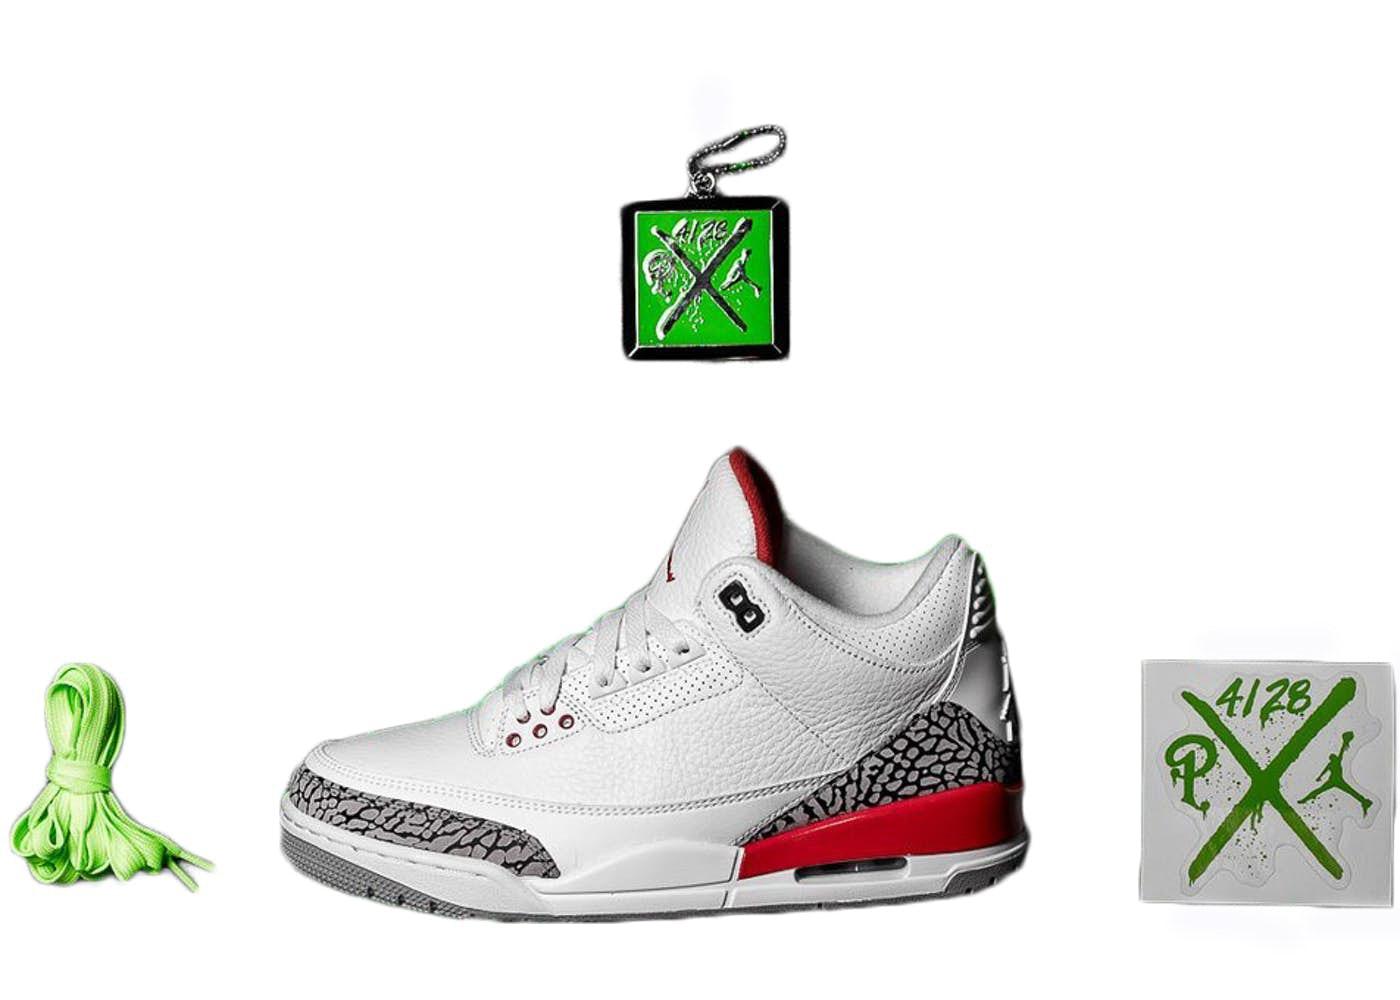 Jordan 3 Retro Hall of Fame (Sneaker Politics Special Release)